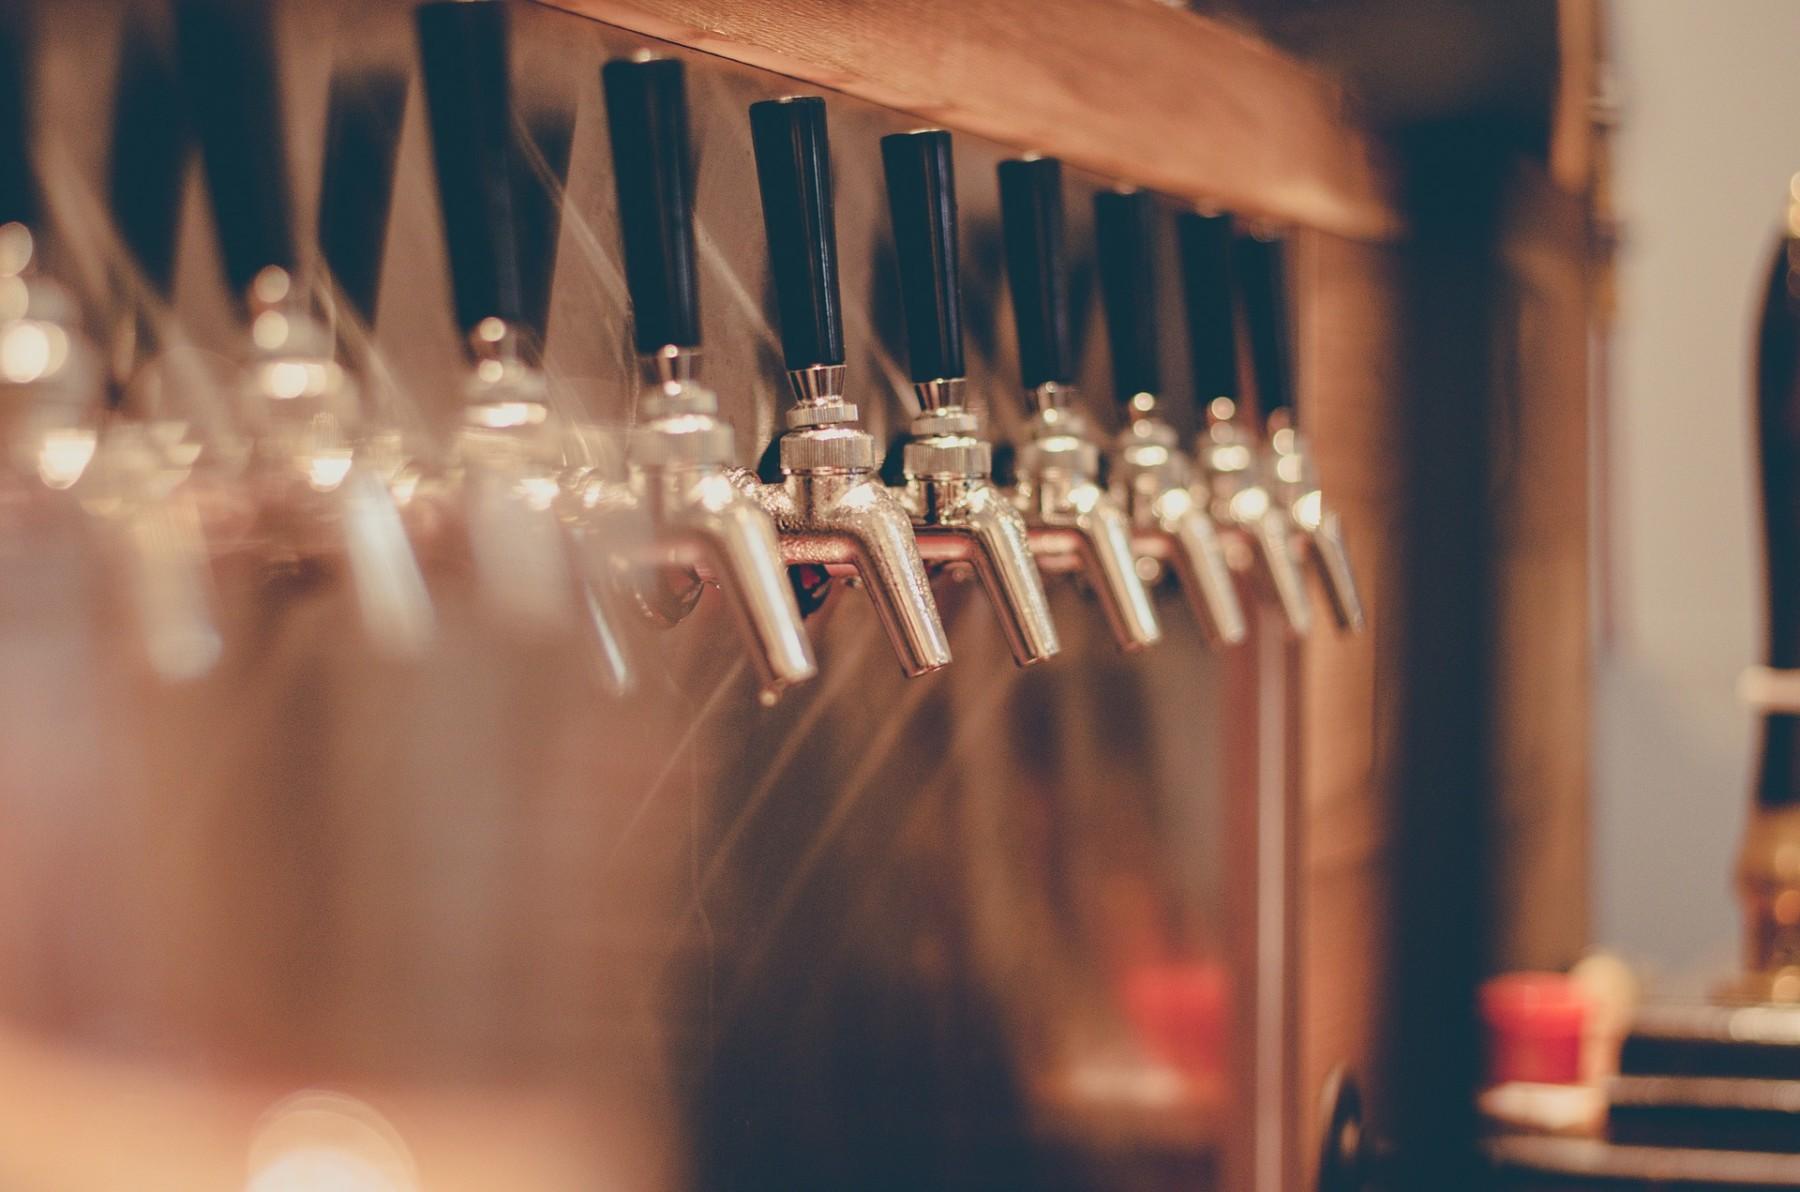 beer-tap-2435408_1920